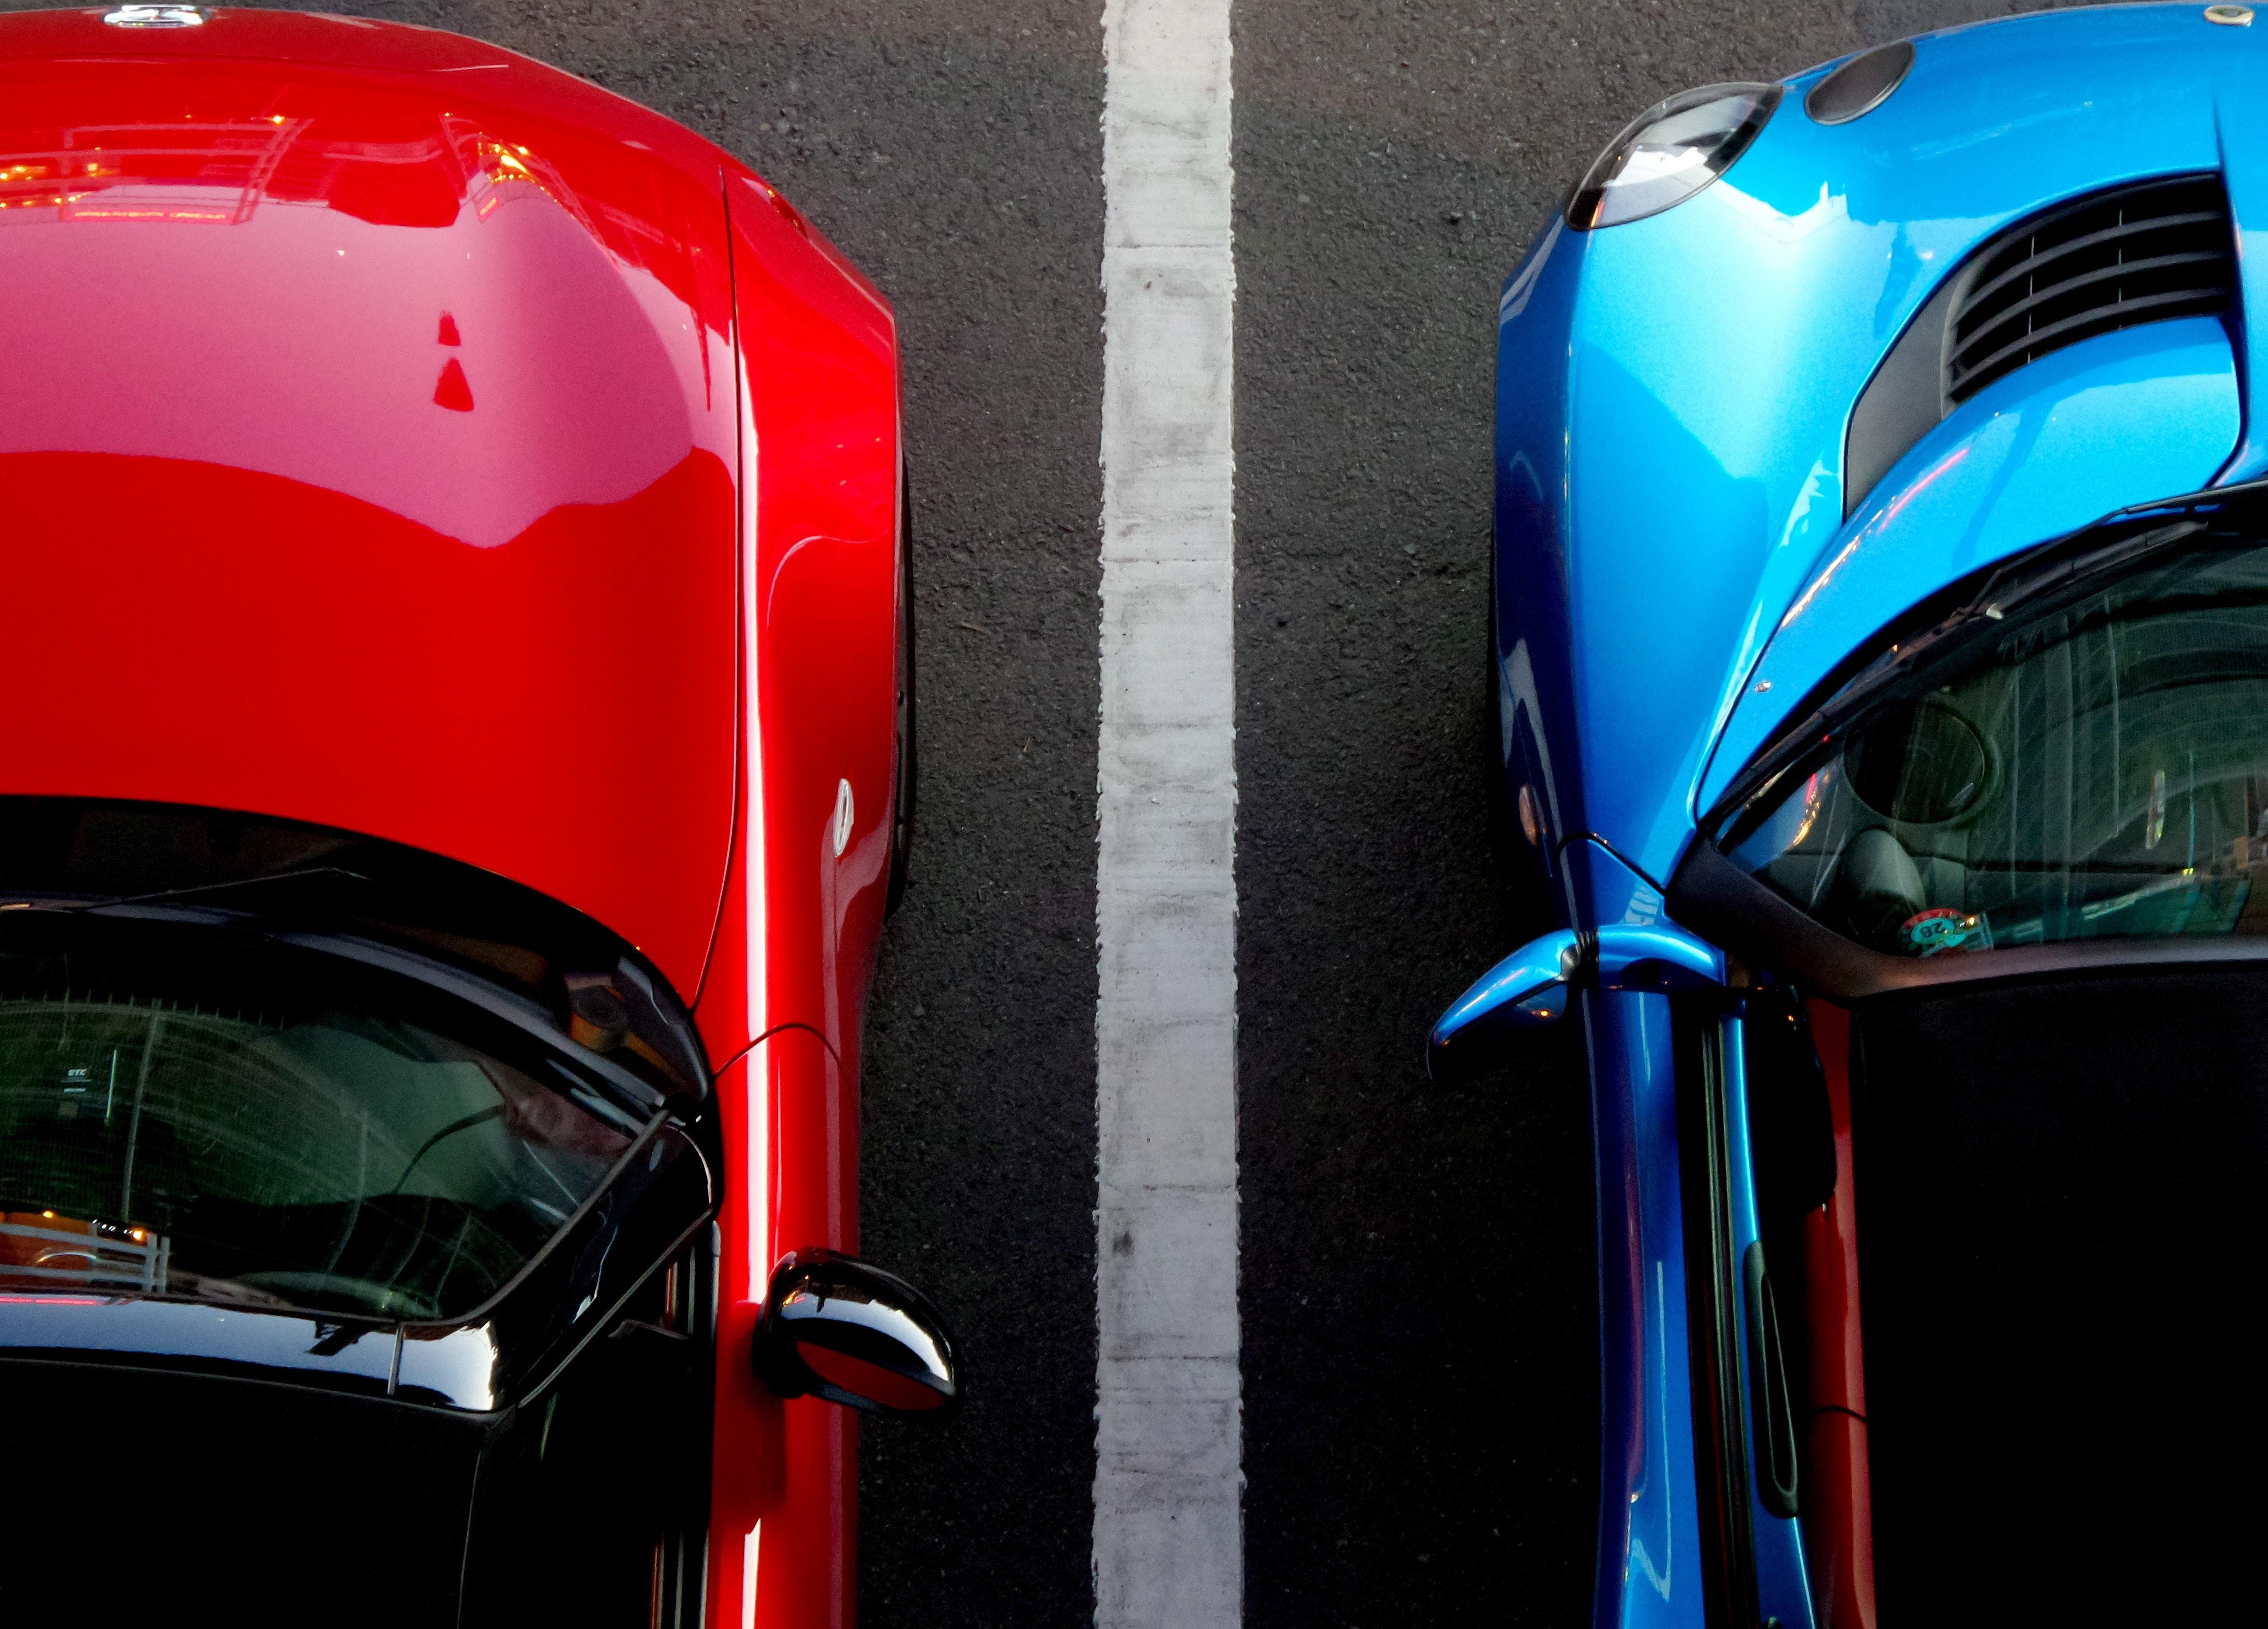 Close-up View of Cars, Auto, Modern, Urban, Travel, HQ Photo